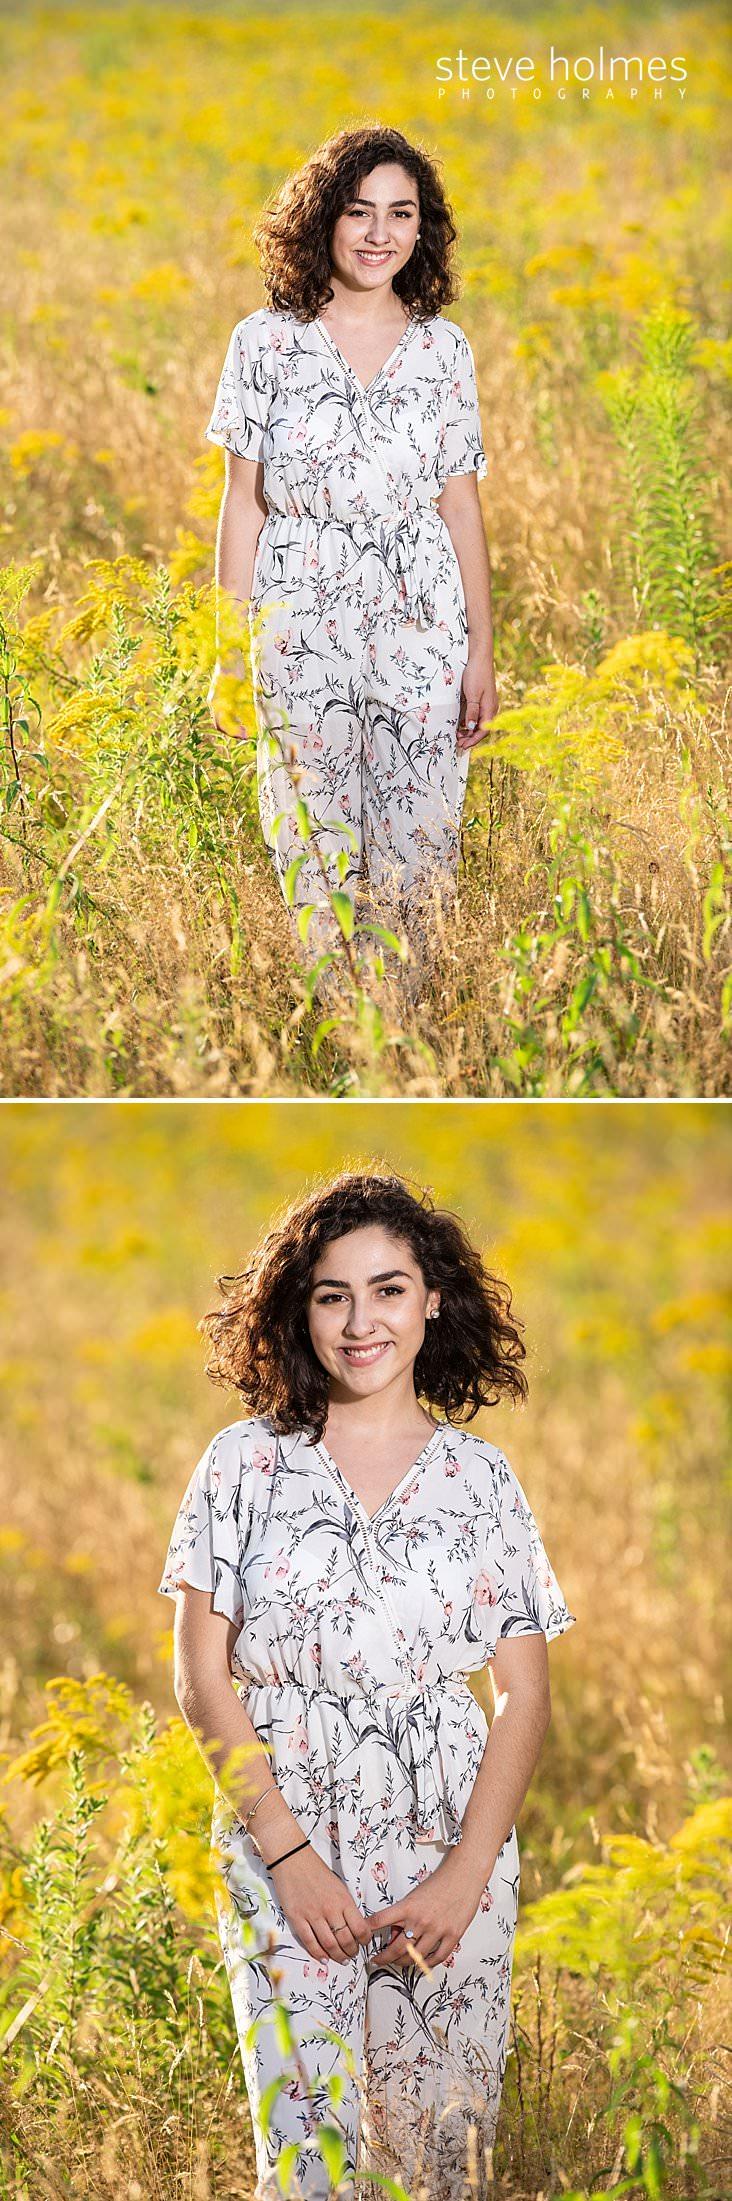 10_Curly haired brunette in jumper walks in a field for senior photo.jpg